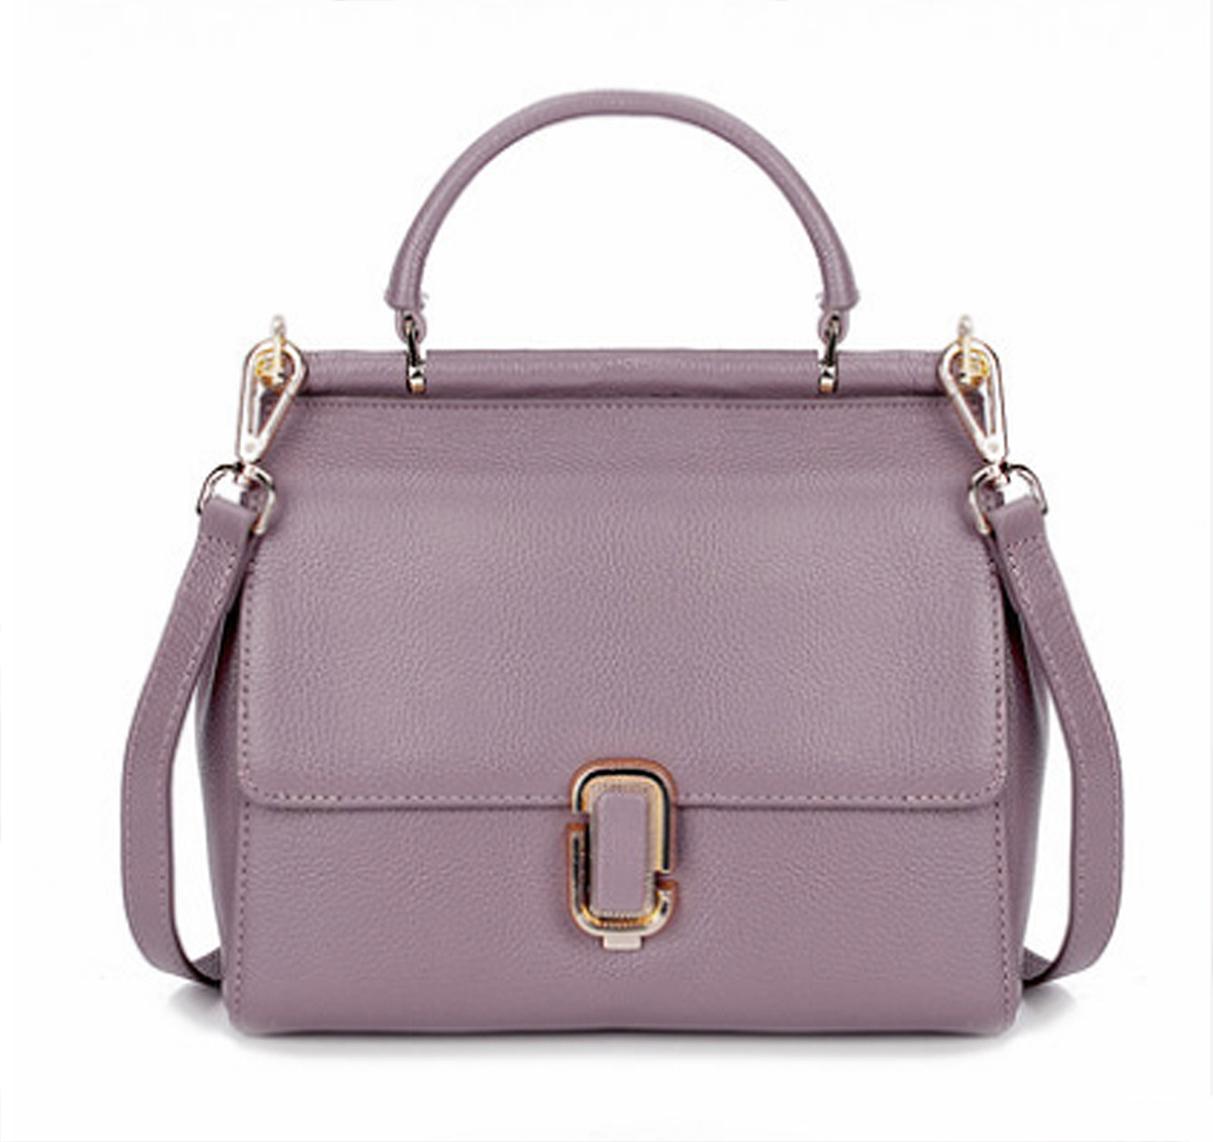 9ab111420bc0 Retro Style Lavender Leather Tote. Genuine Leather Light Purple ...